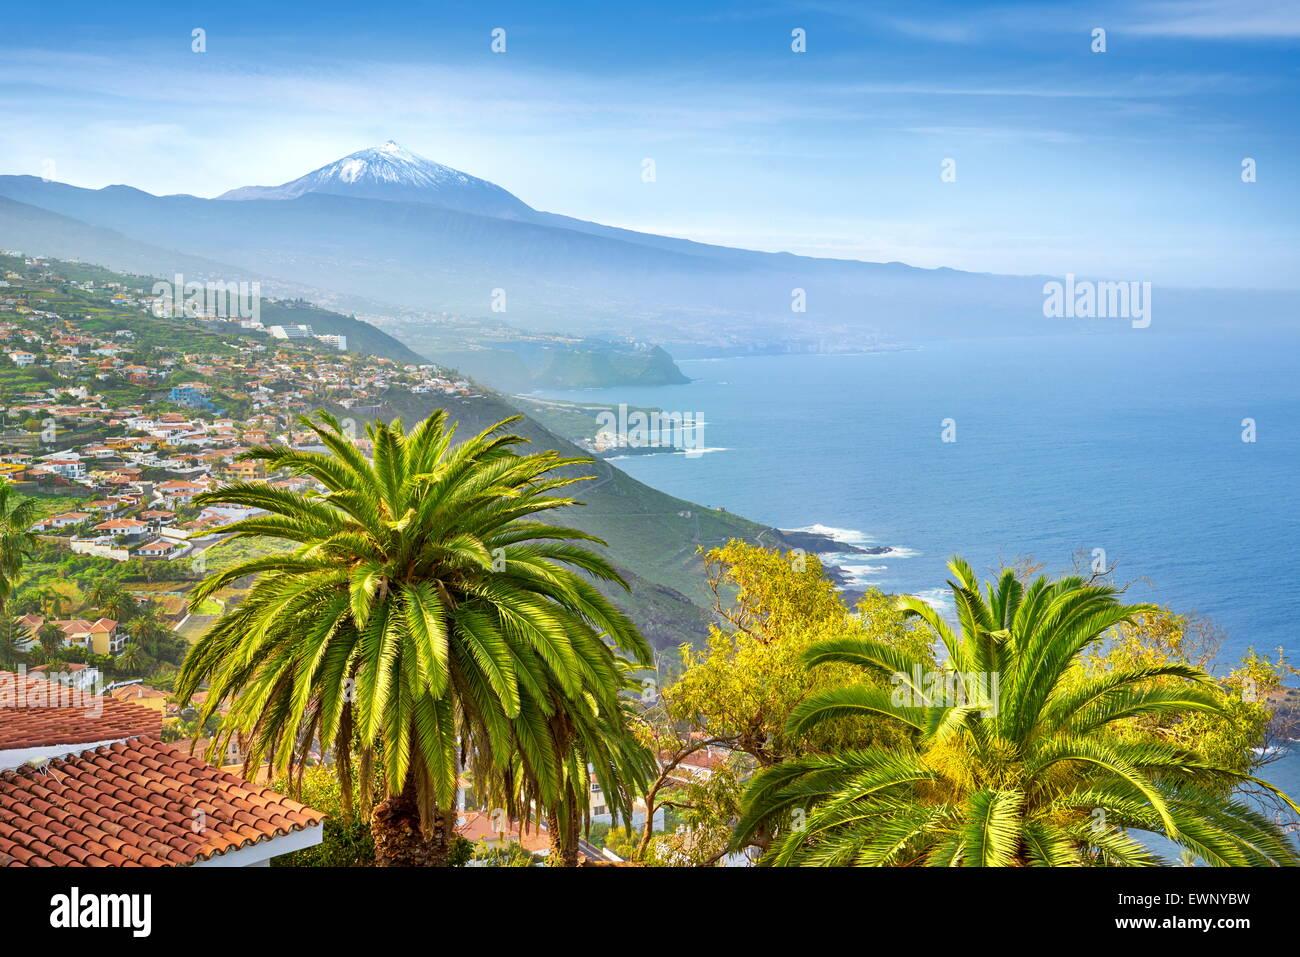 La côte nord de Tenerife, Canaries, Espagne Photo Stock